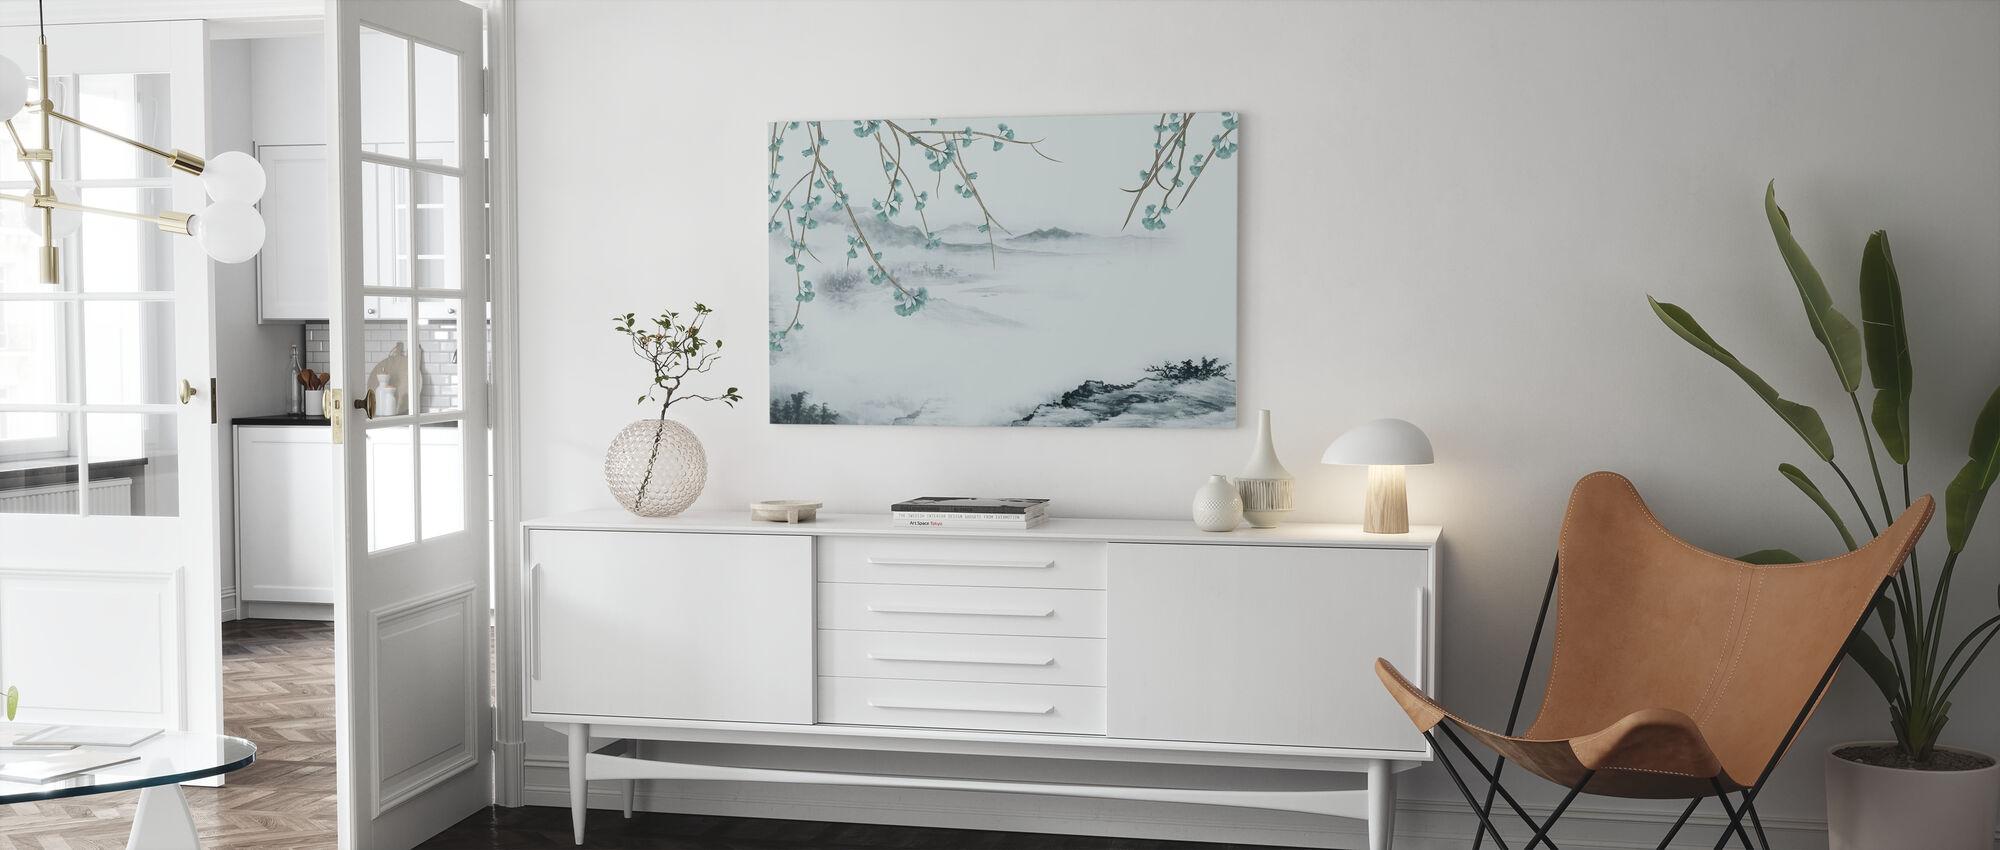 Kinesiskt landskap - Canvastavla - Vardagsrum